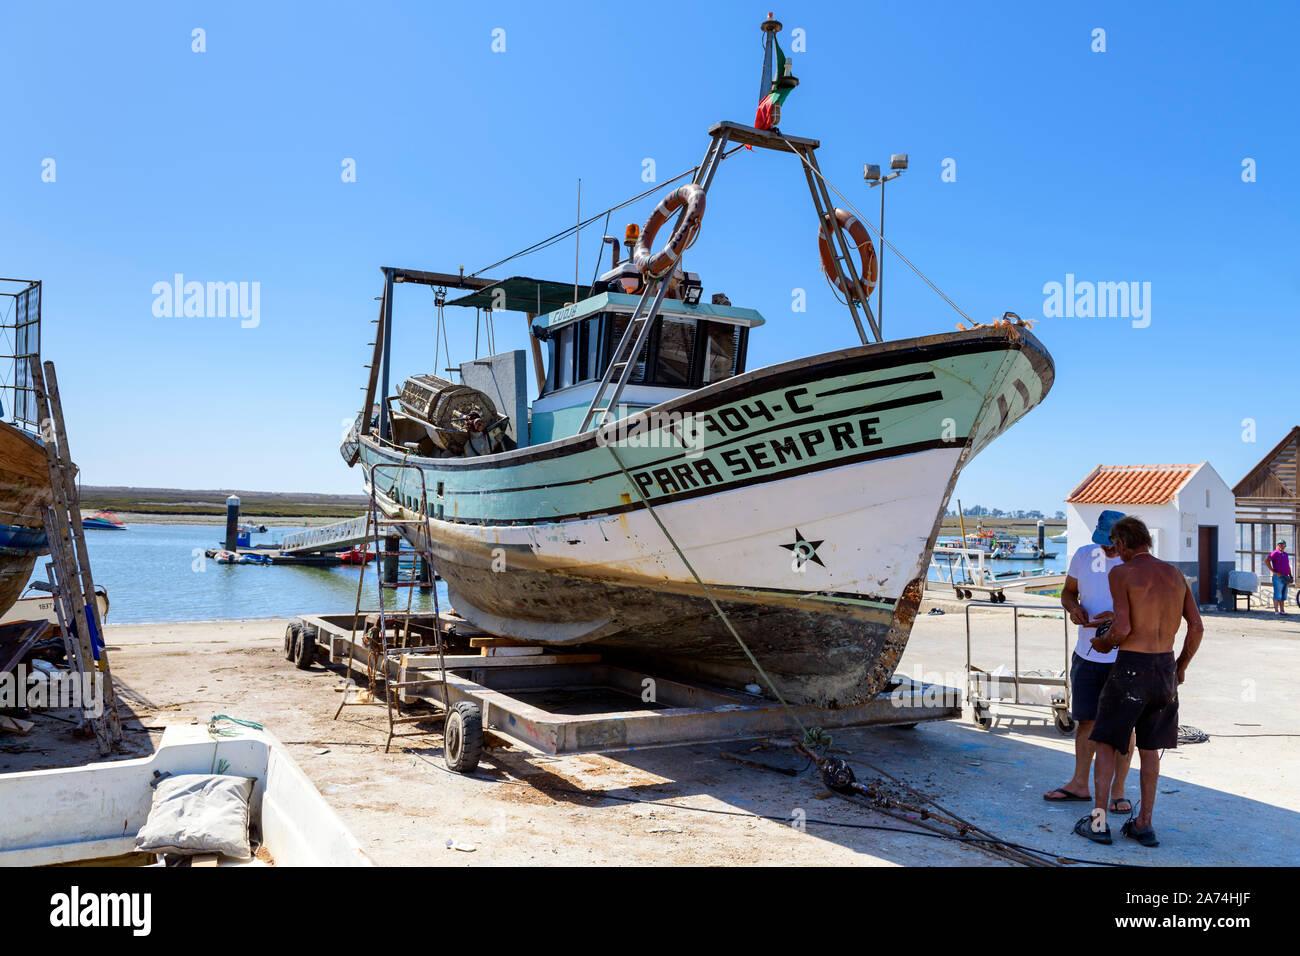 09.16.2019. Algarve, Portugal. Fishing boat under repair, Santa Luzia, East Algarve Stock Photo